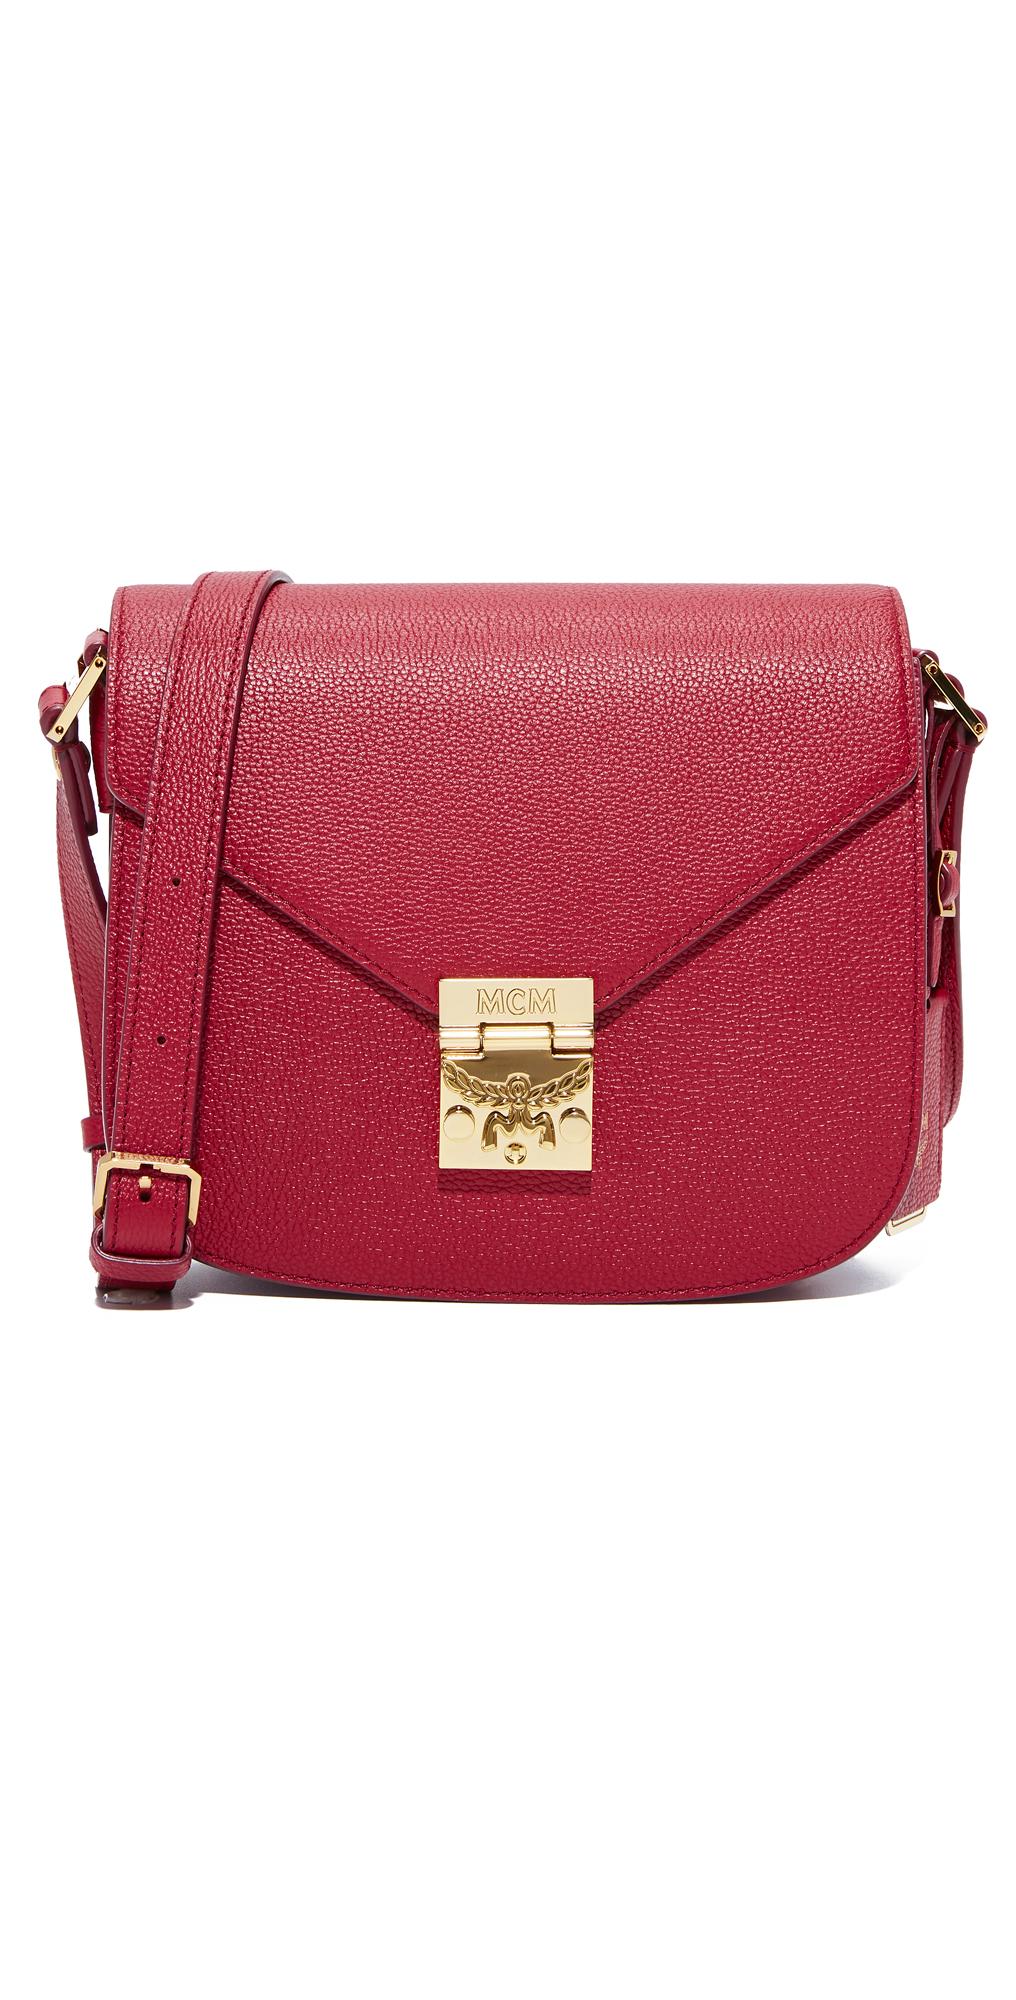 Patricia Saddle Bag MCM